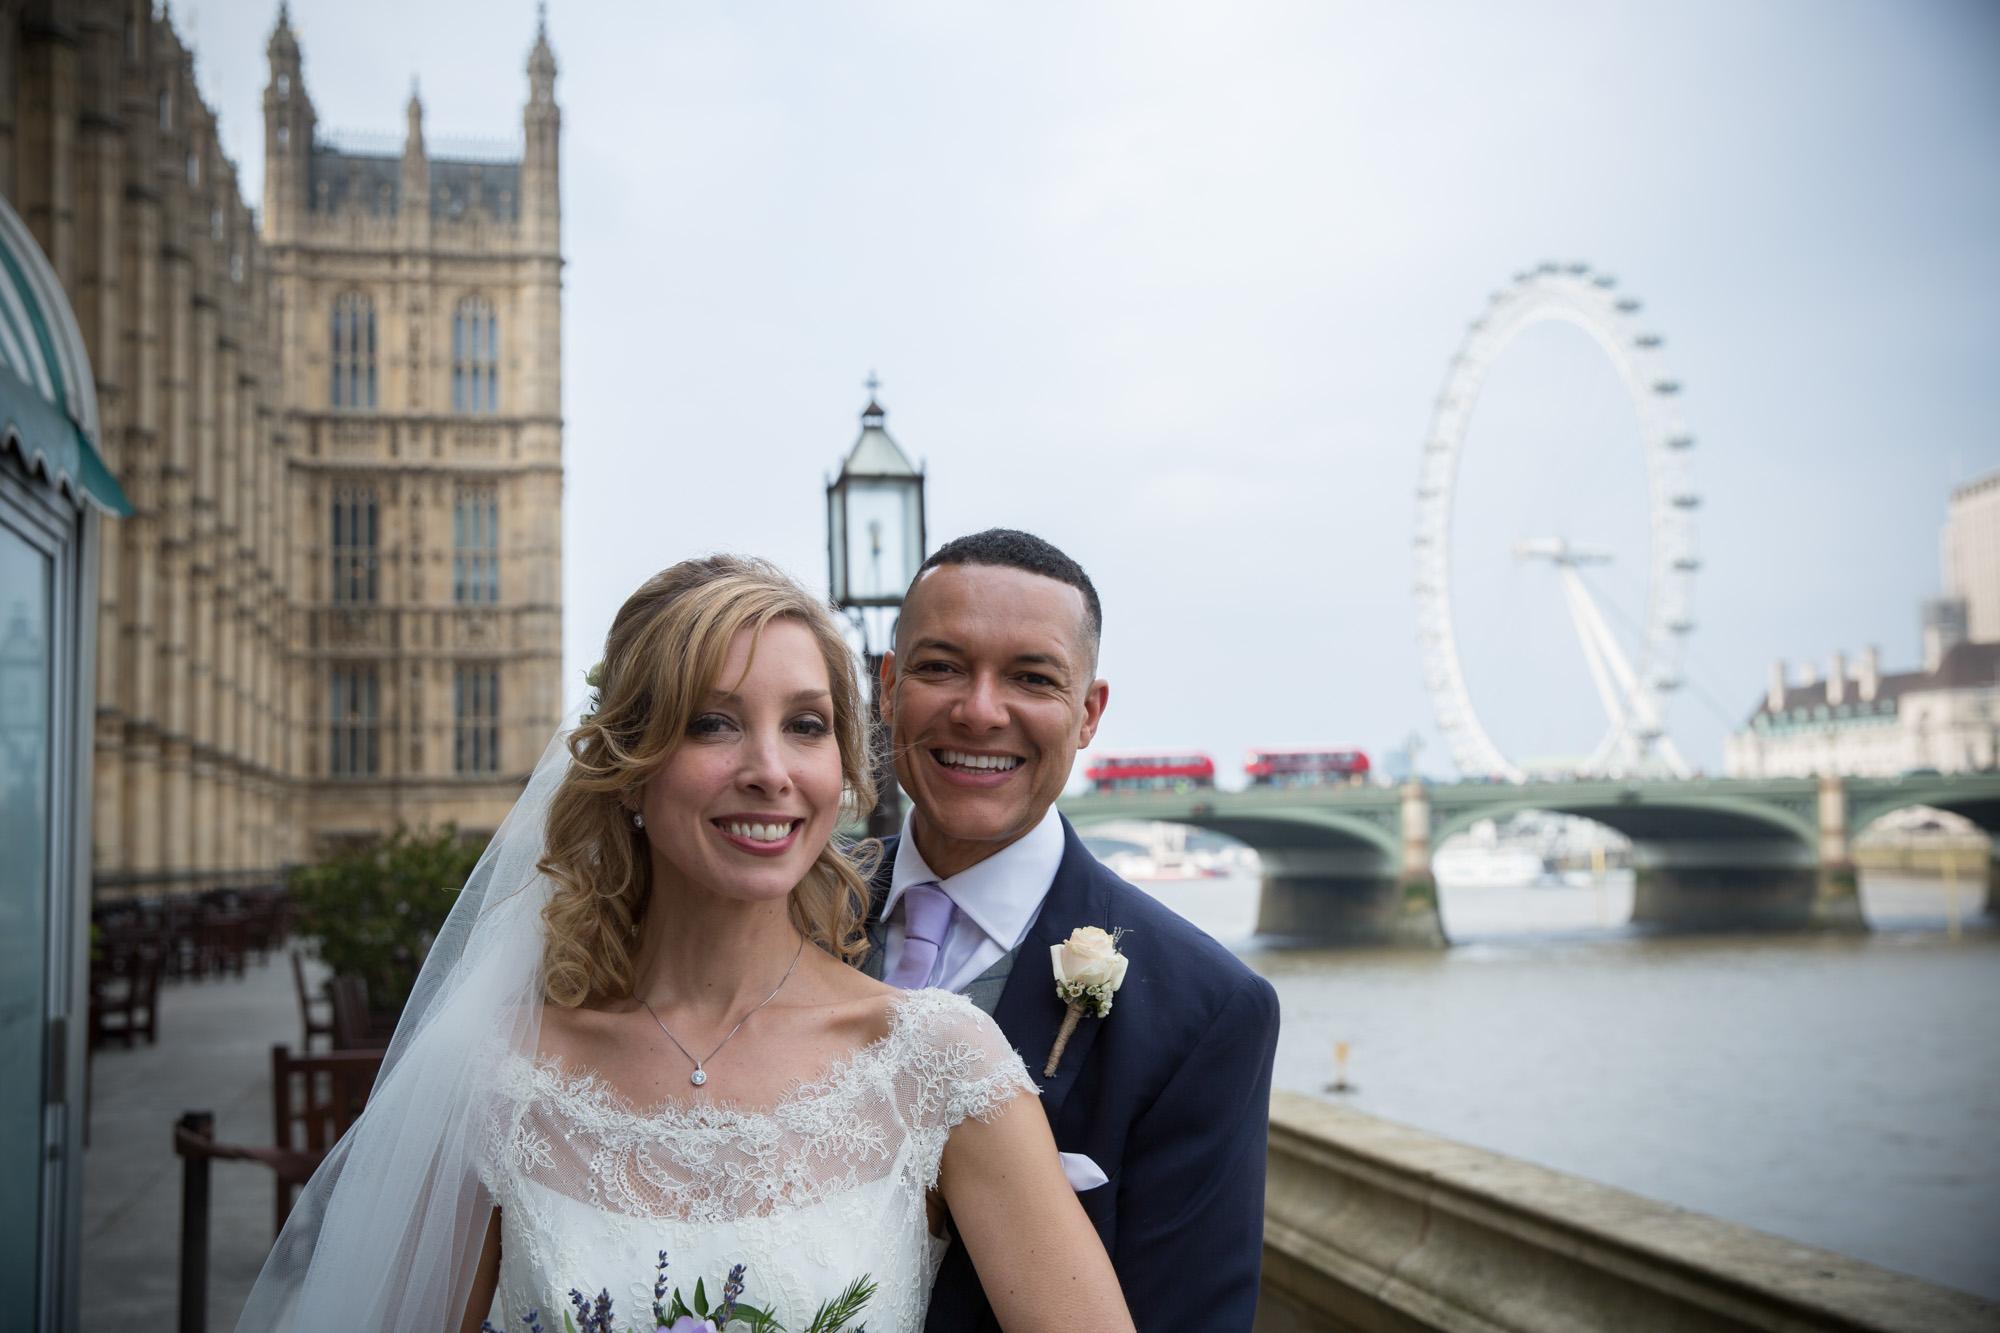 weddings-couples-love-photographer-oxford-london-jonathan-self-photography-73.jpg